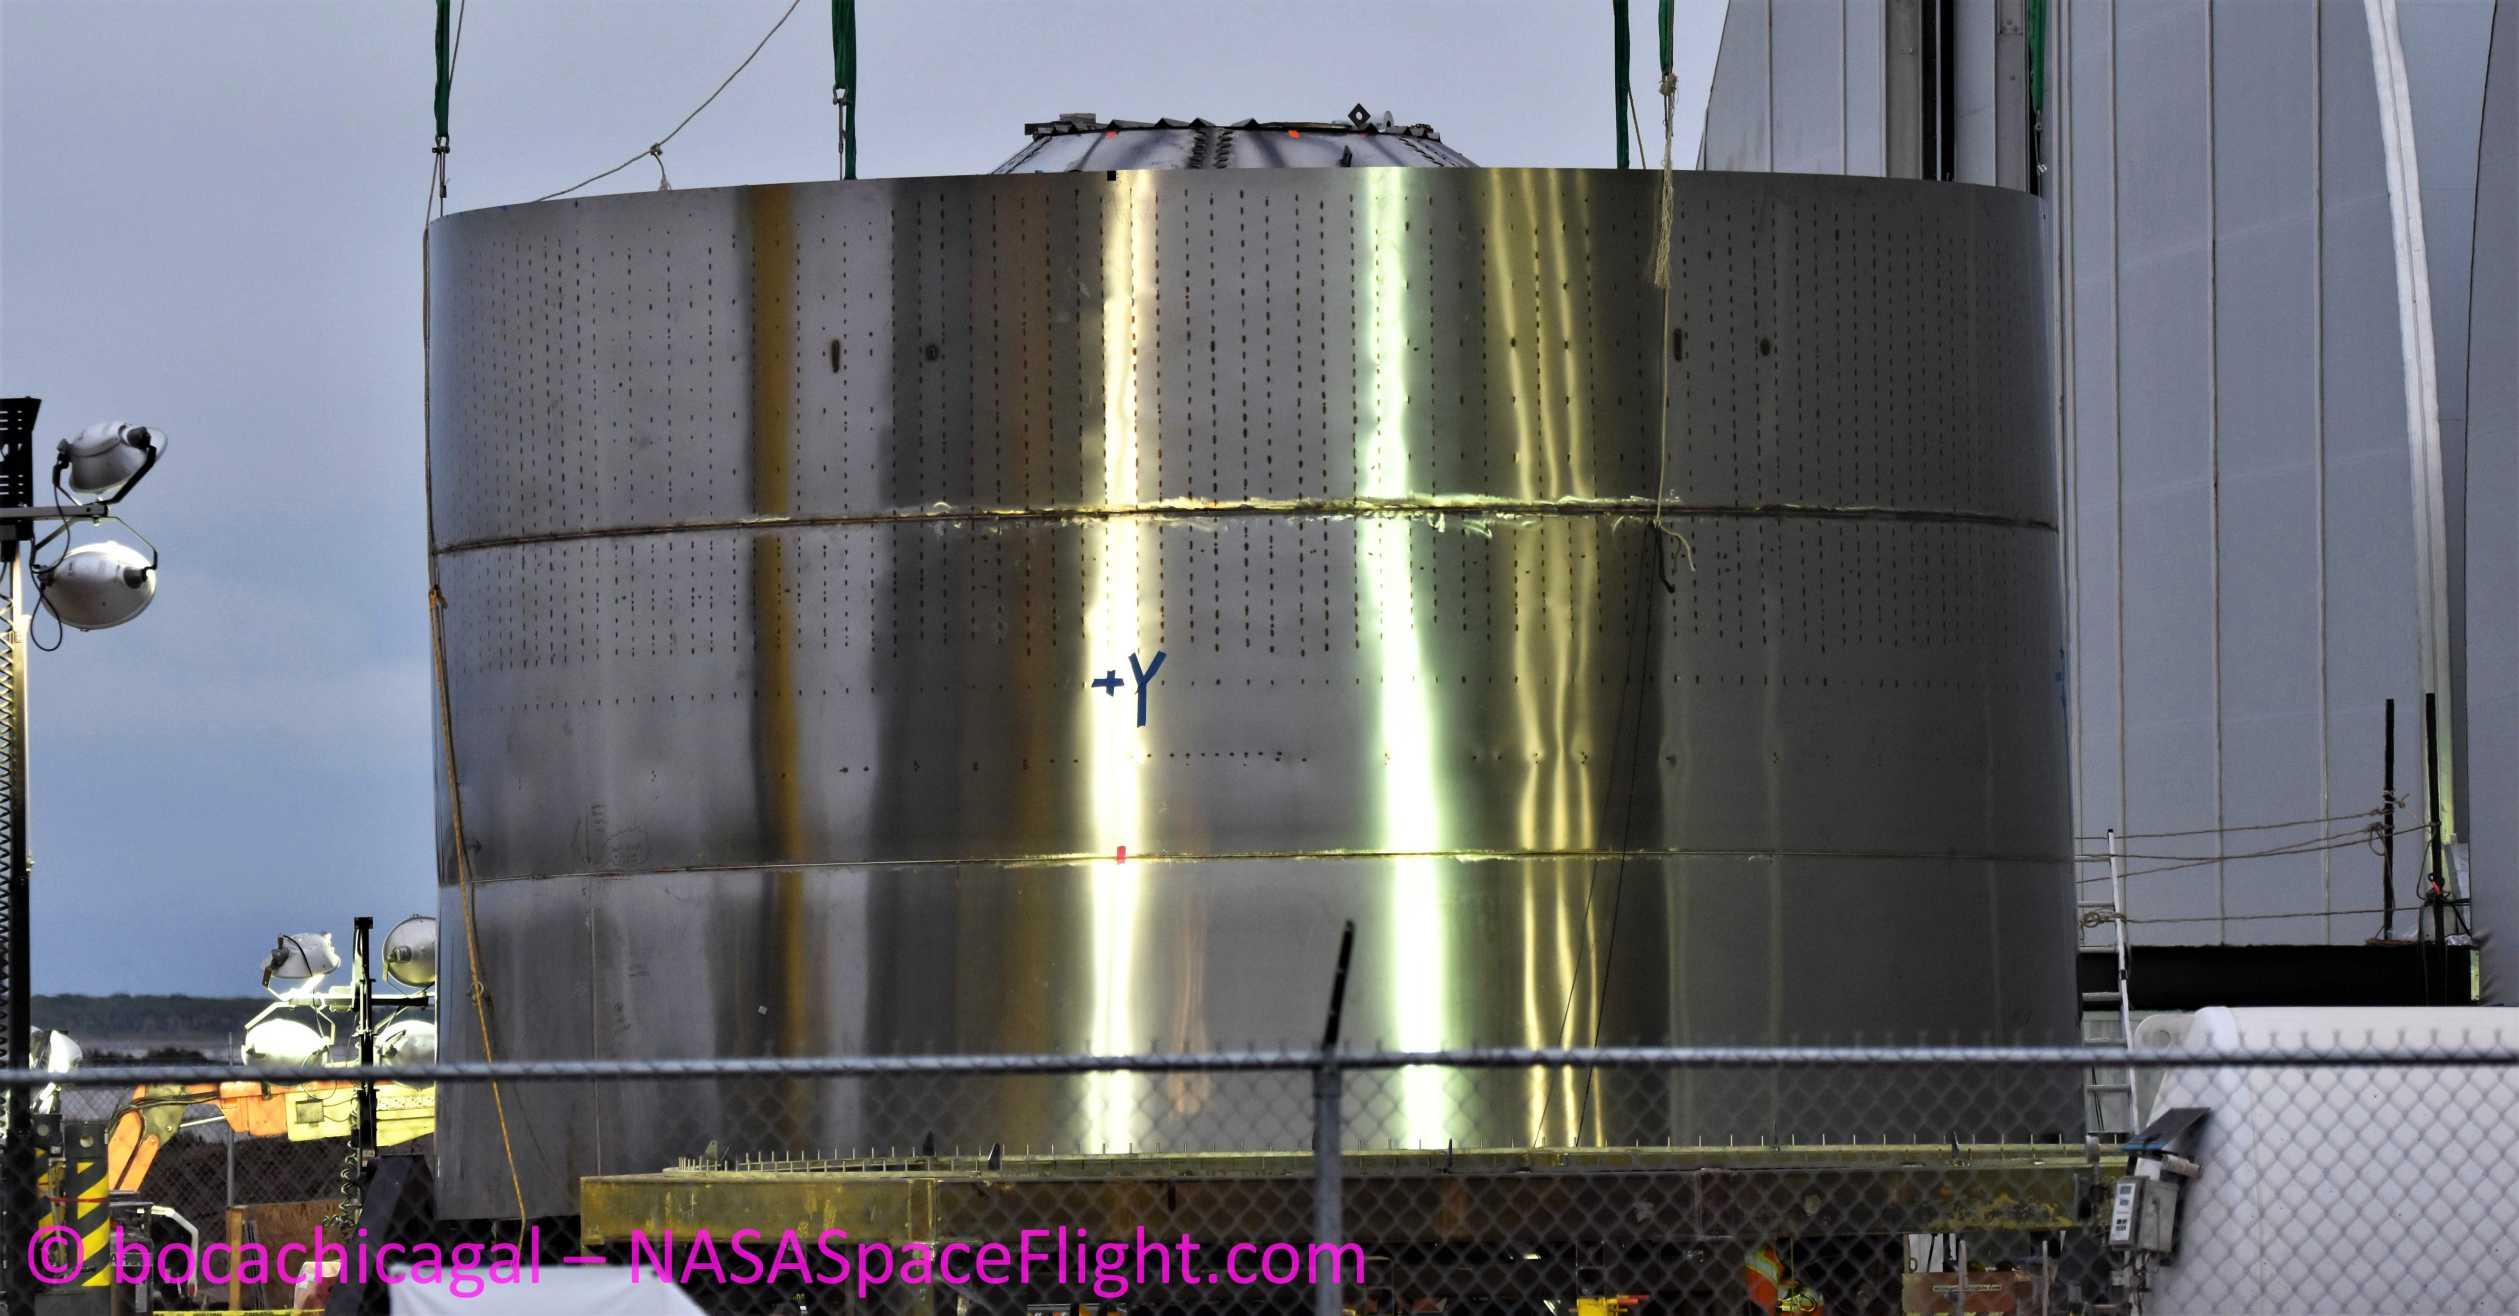 Starship Boca Chica 021220 (NASASpaceflight – bocachicagal) SN01 engine section 1 crop (c)